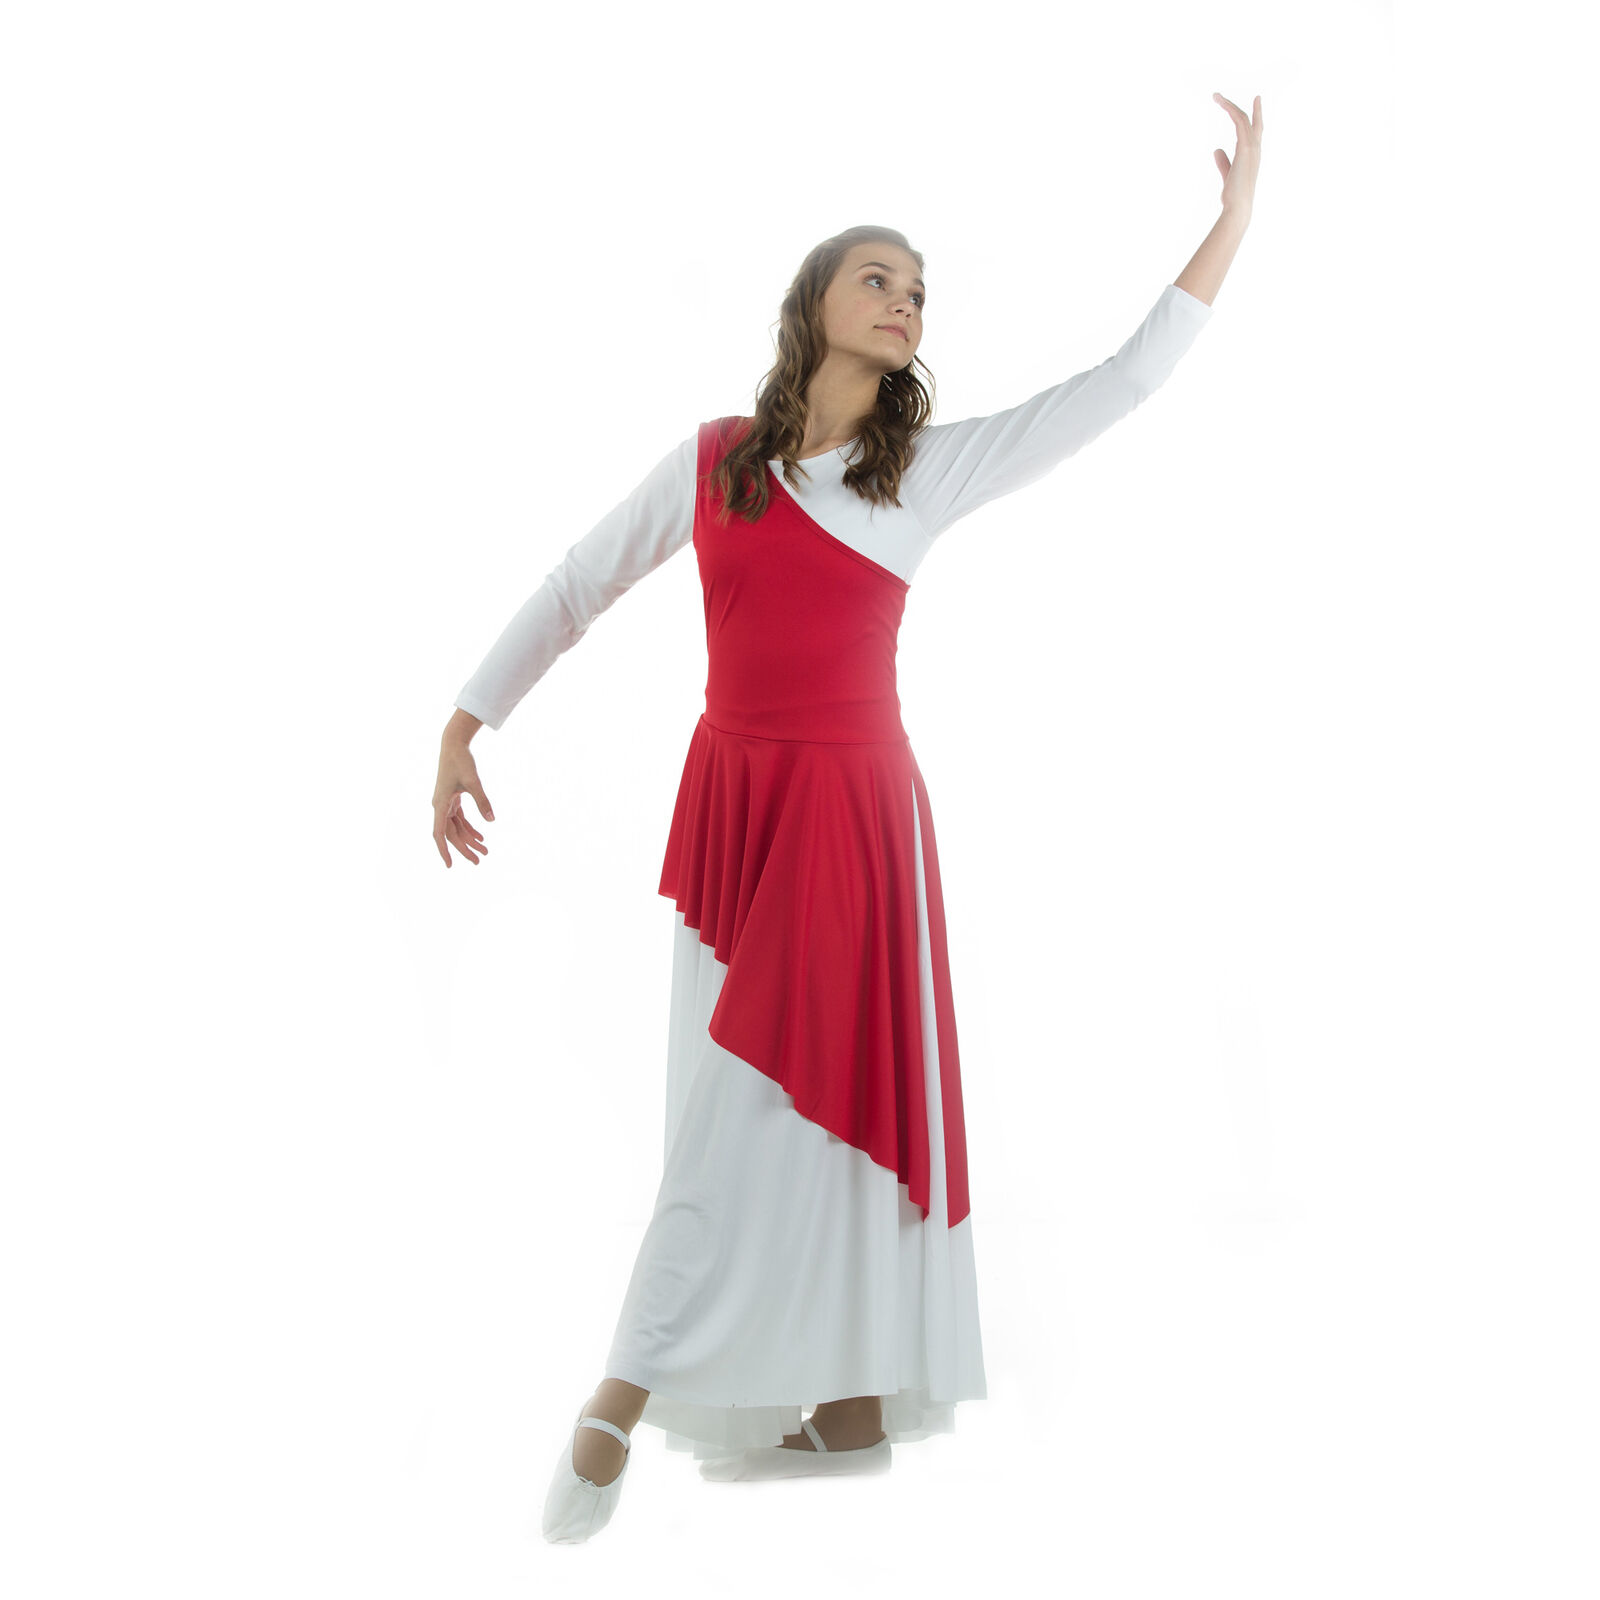 4f53e40037eb Danzcue Asymmetrical Praise Dance Top Scarlet S/m-adult for sale ...